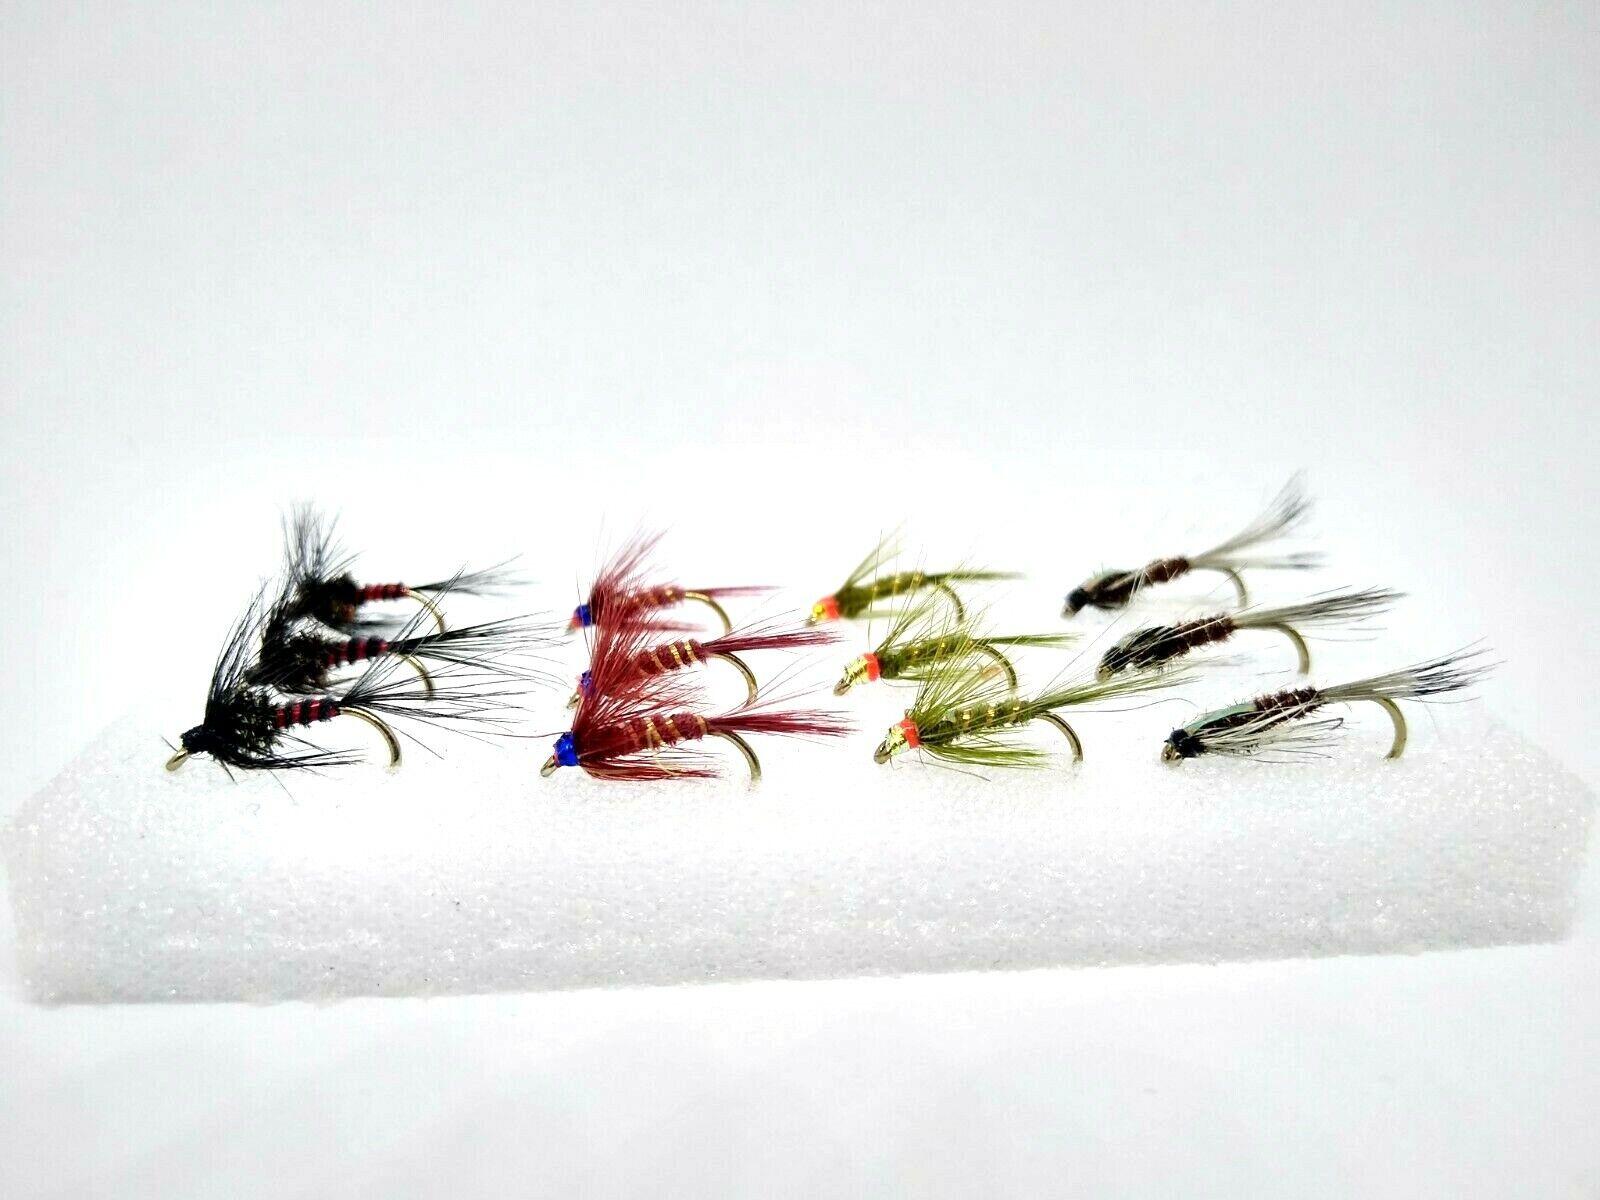 Ref N20 trout nymph Cruncher size 12 6 No